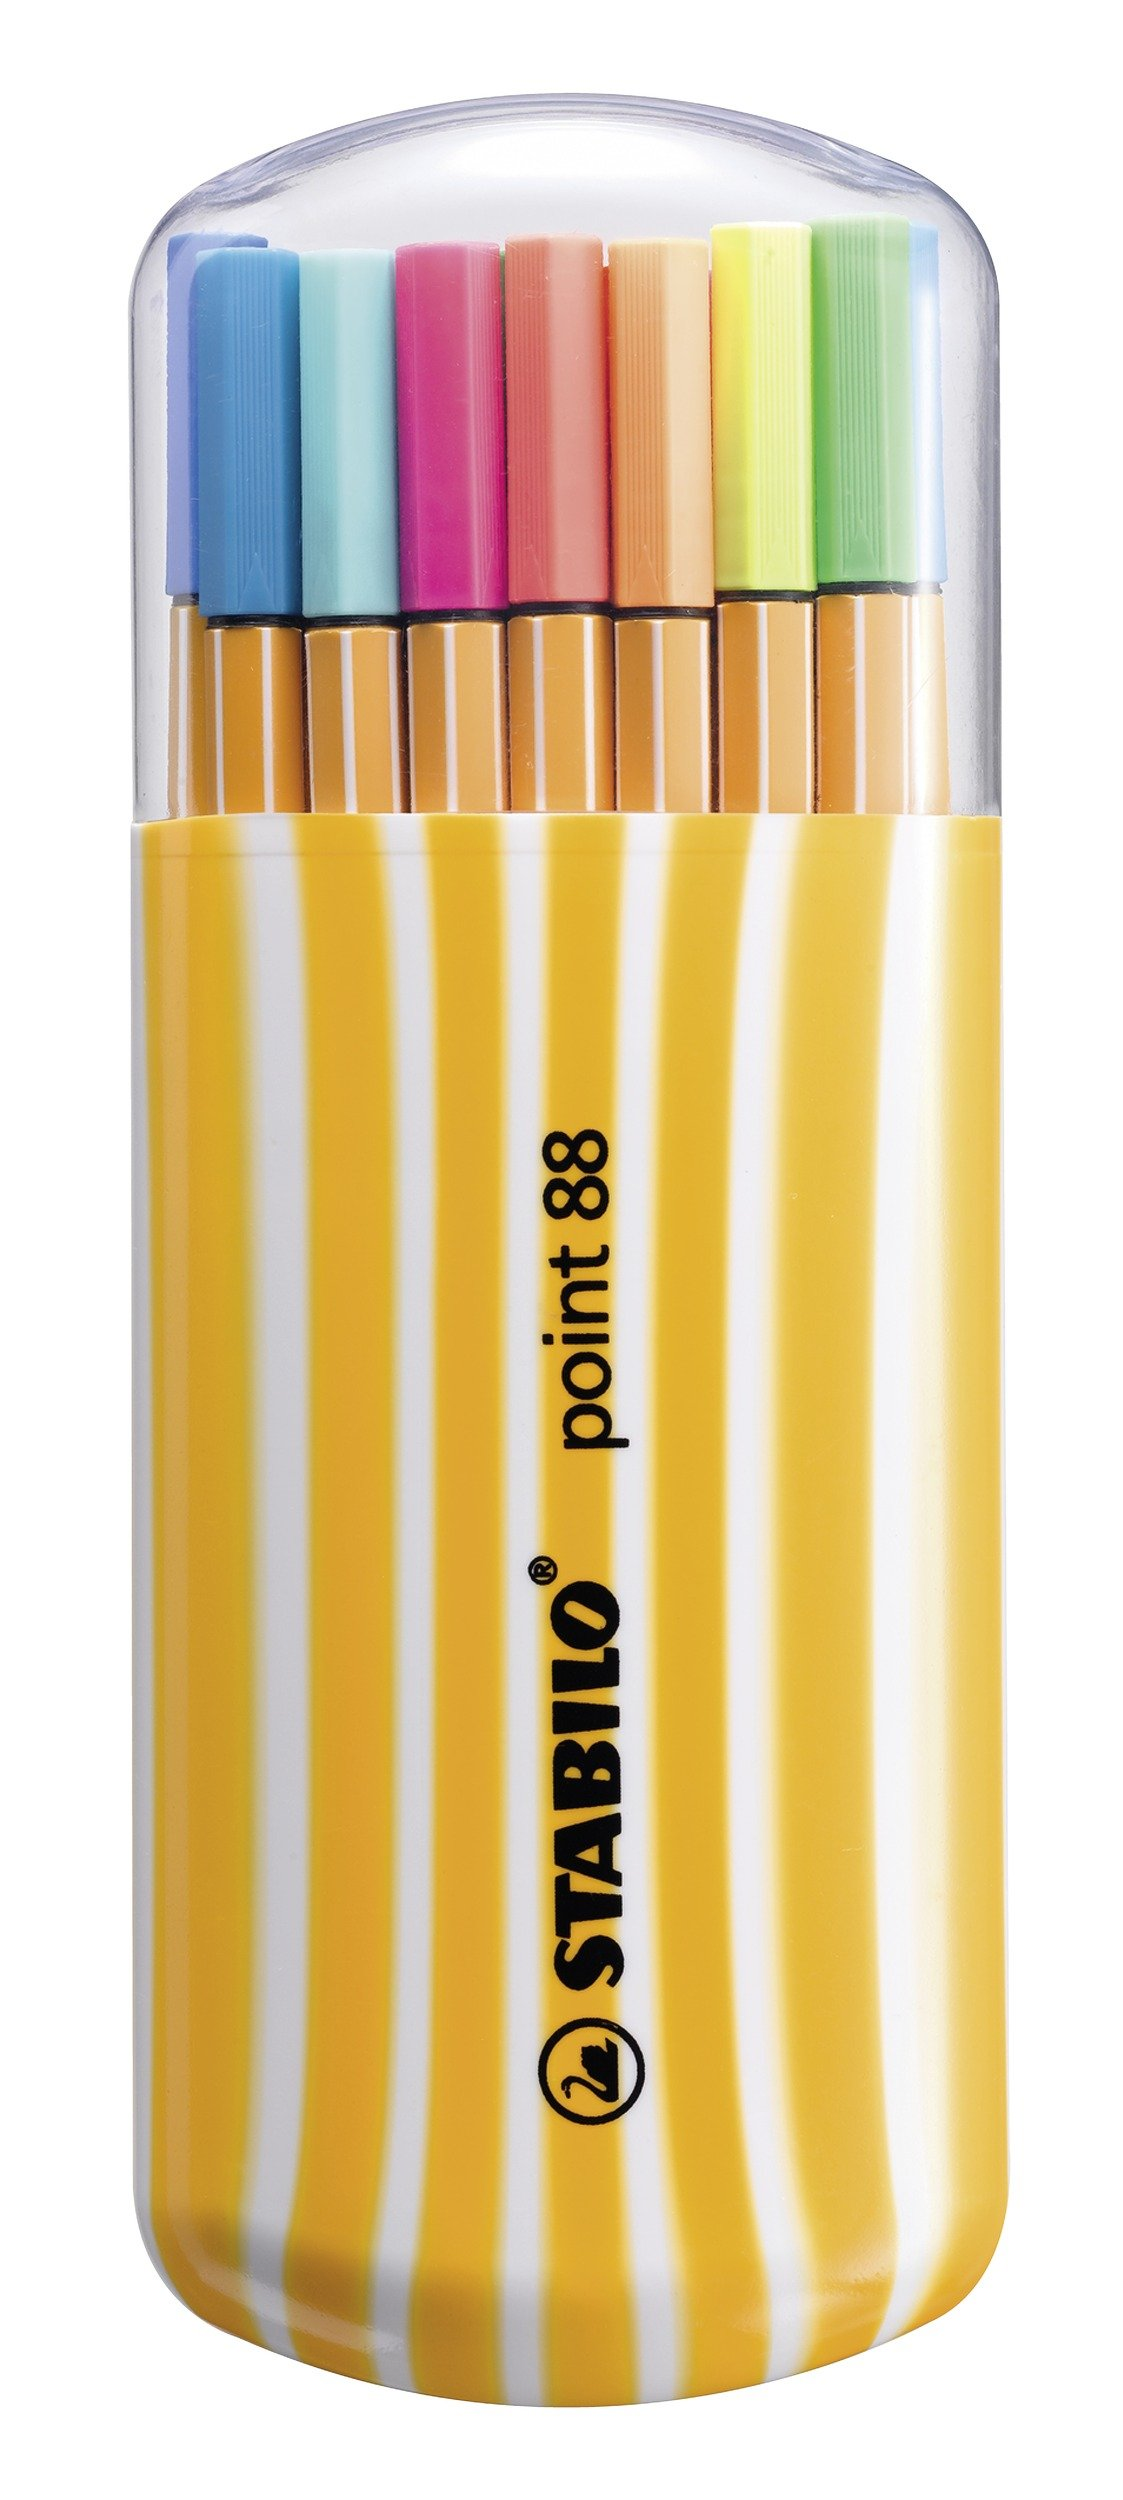 Rotulador punta fina STABILO point 88 – Estuche premium Zebrui con 20 colores